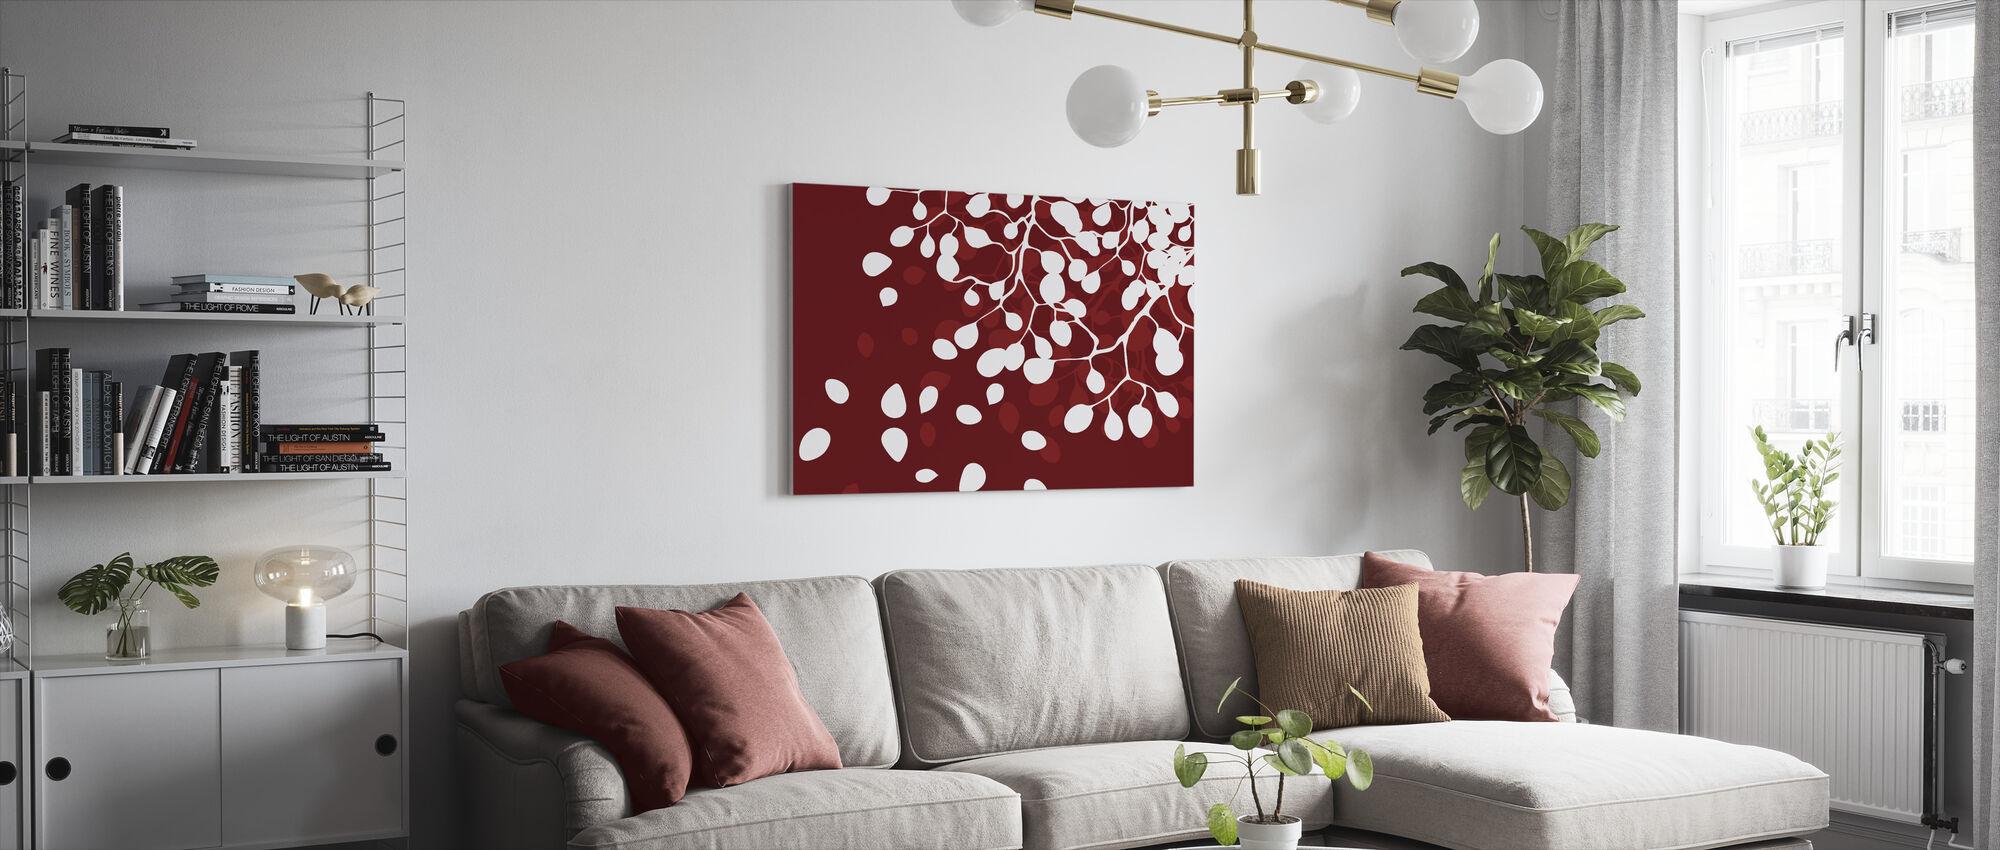 Birke - Urlaub Rot - Leinwandbild - Wohnzimmer